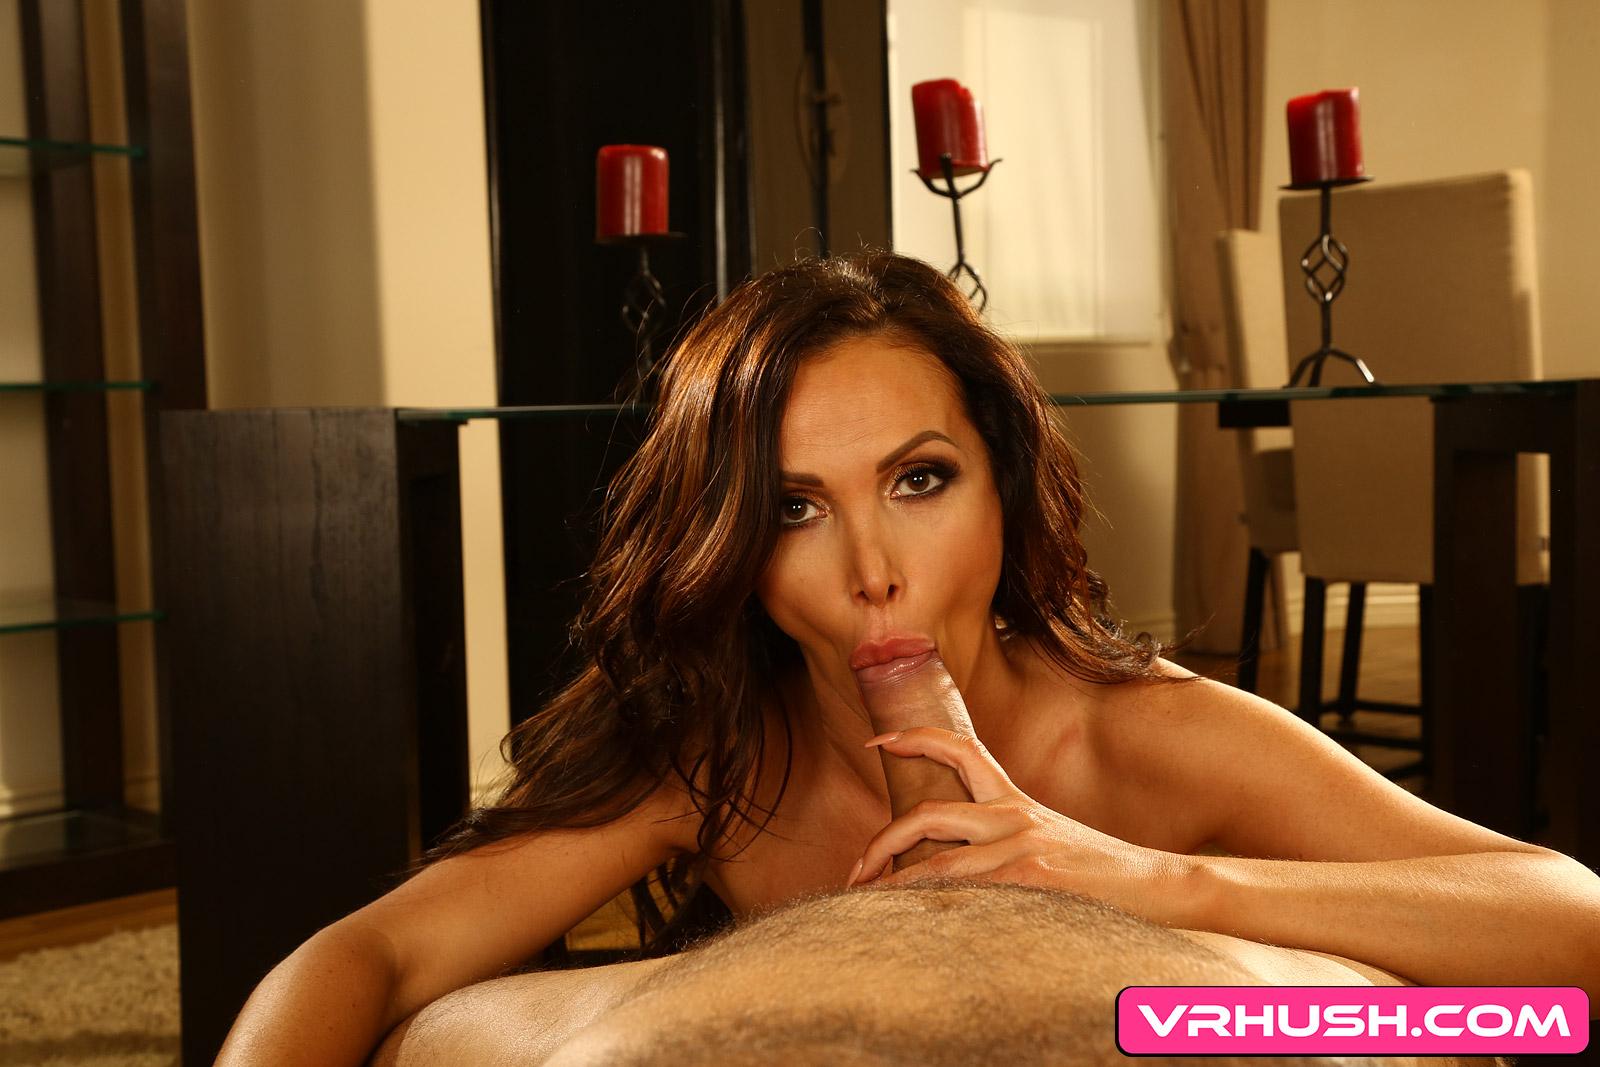 Nikki Benz & VRHush | SexLikeReal